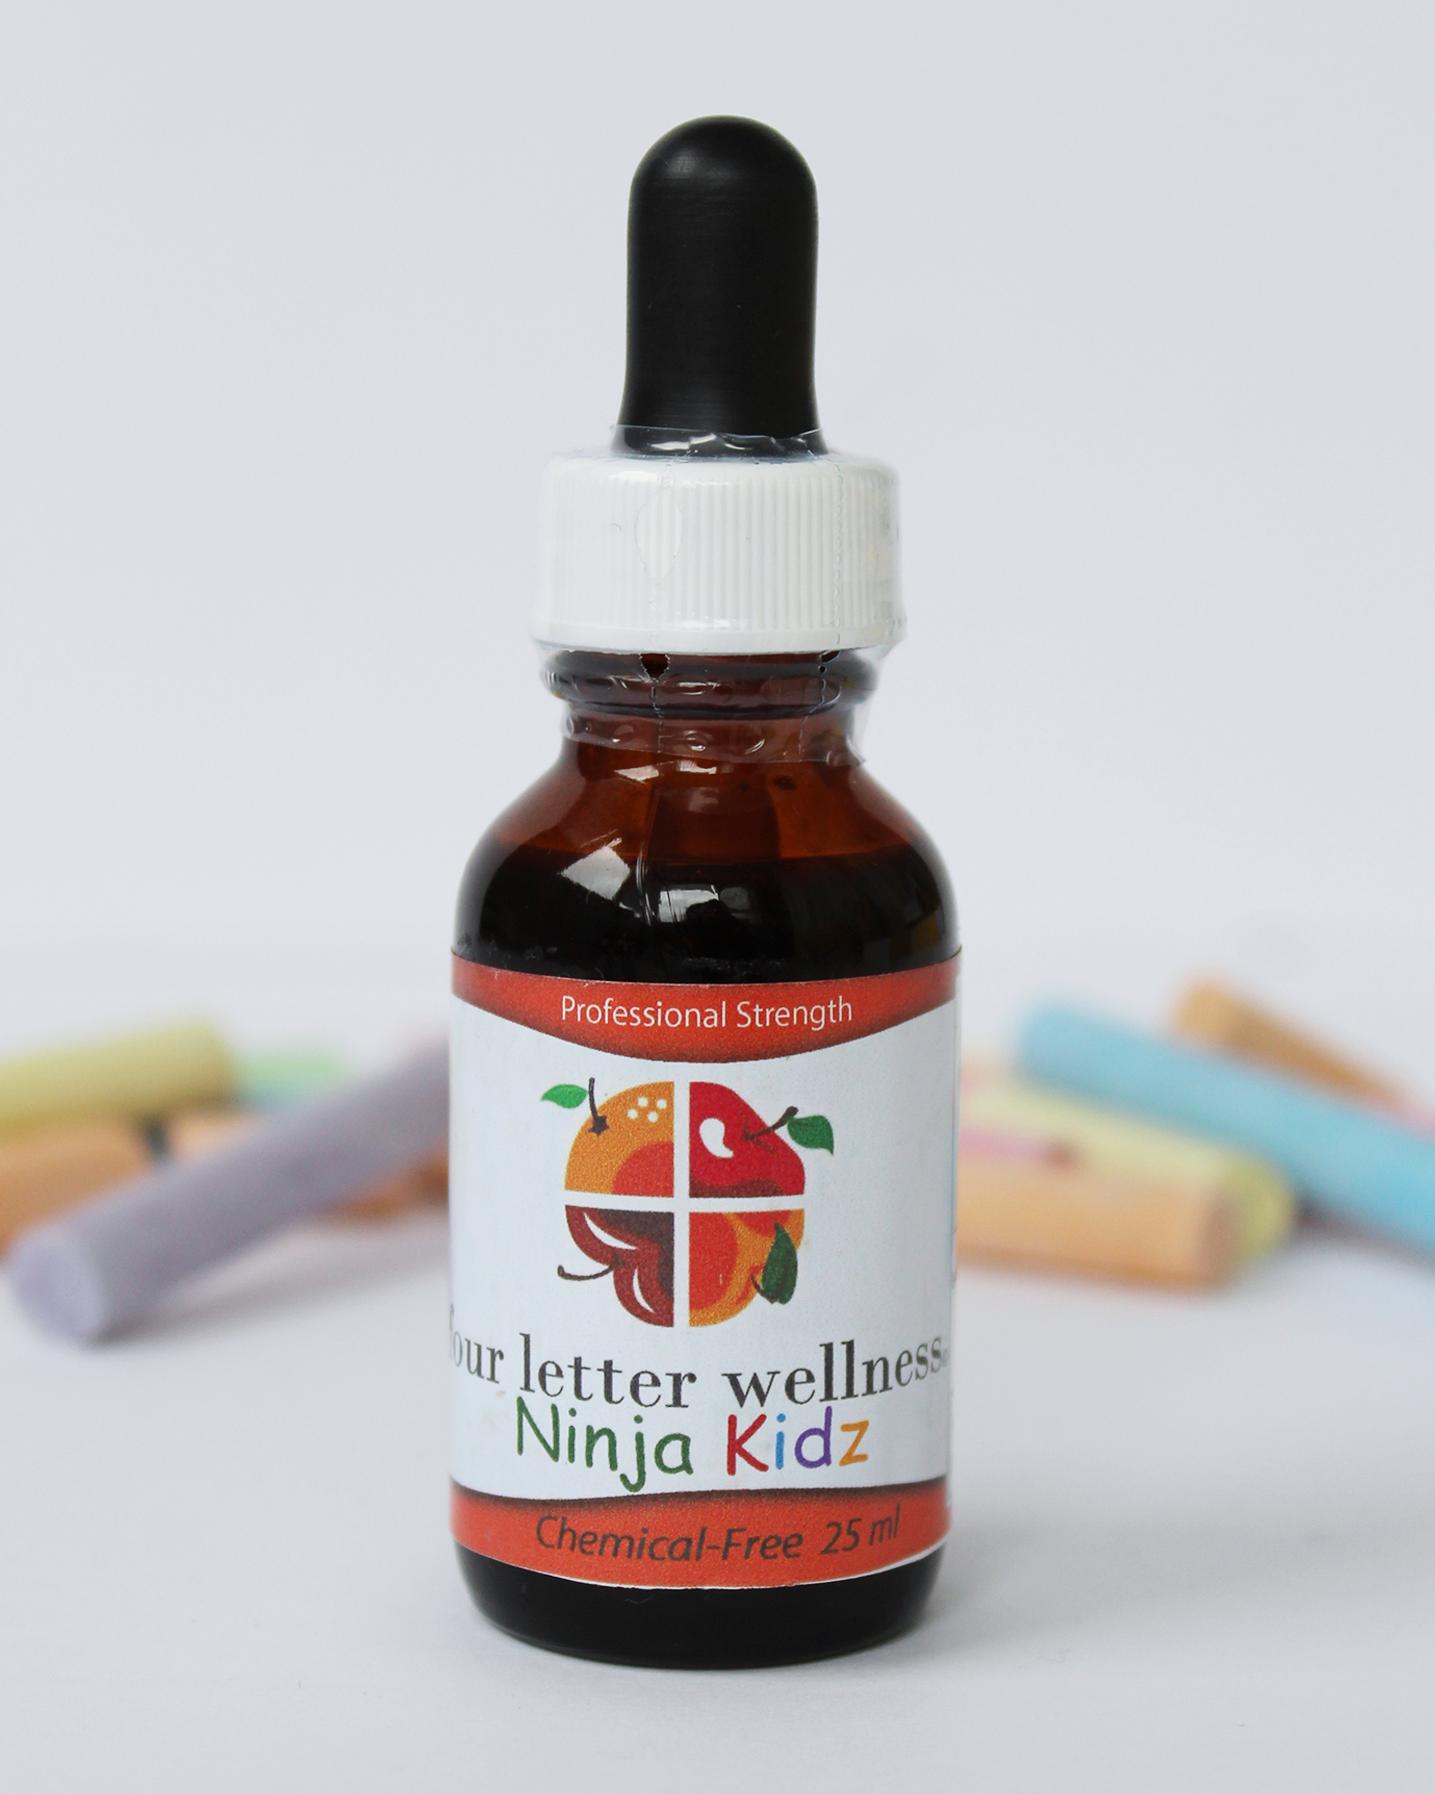 Ninja Kidz - Herbal Tincture 00004